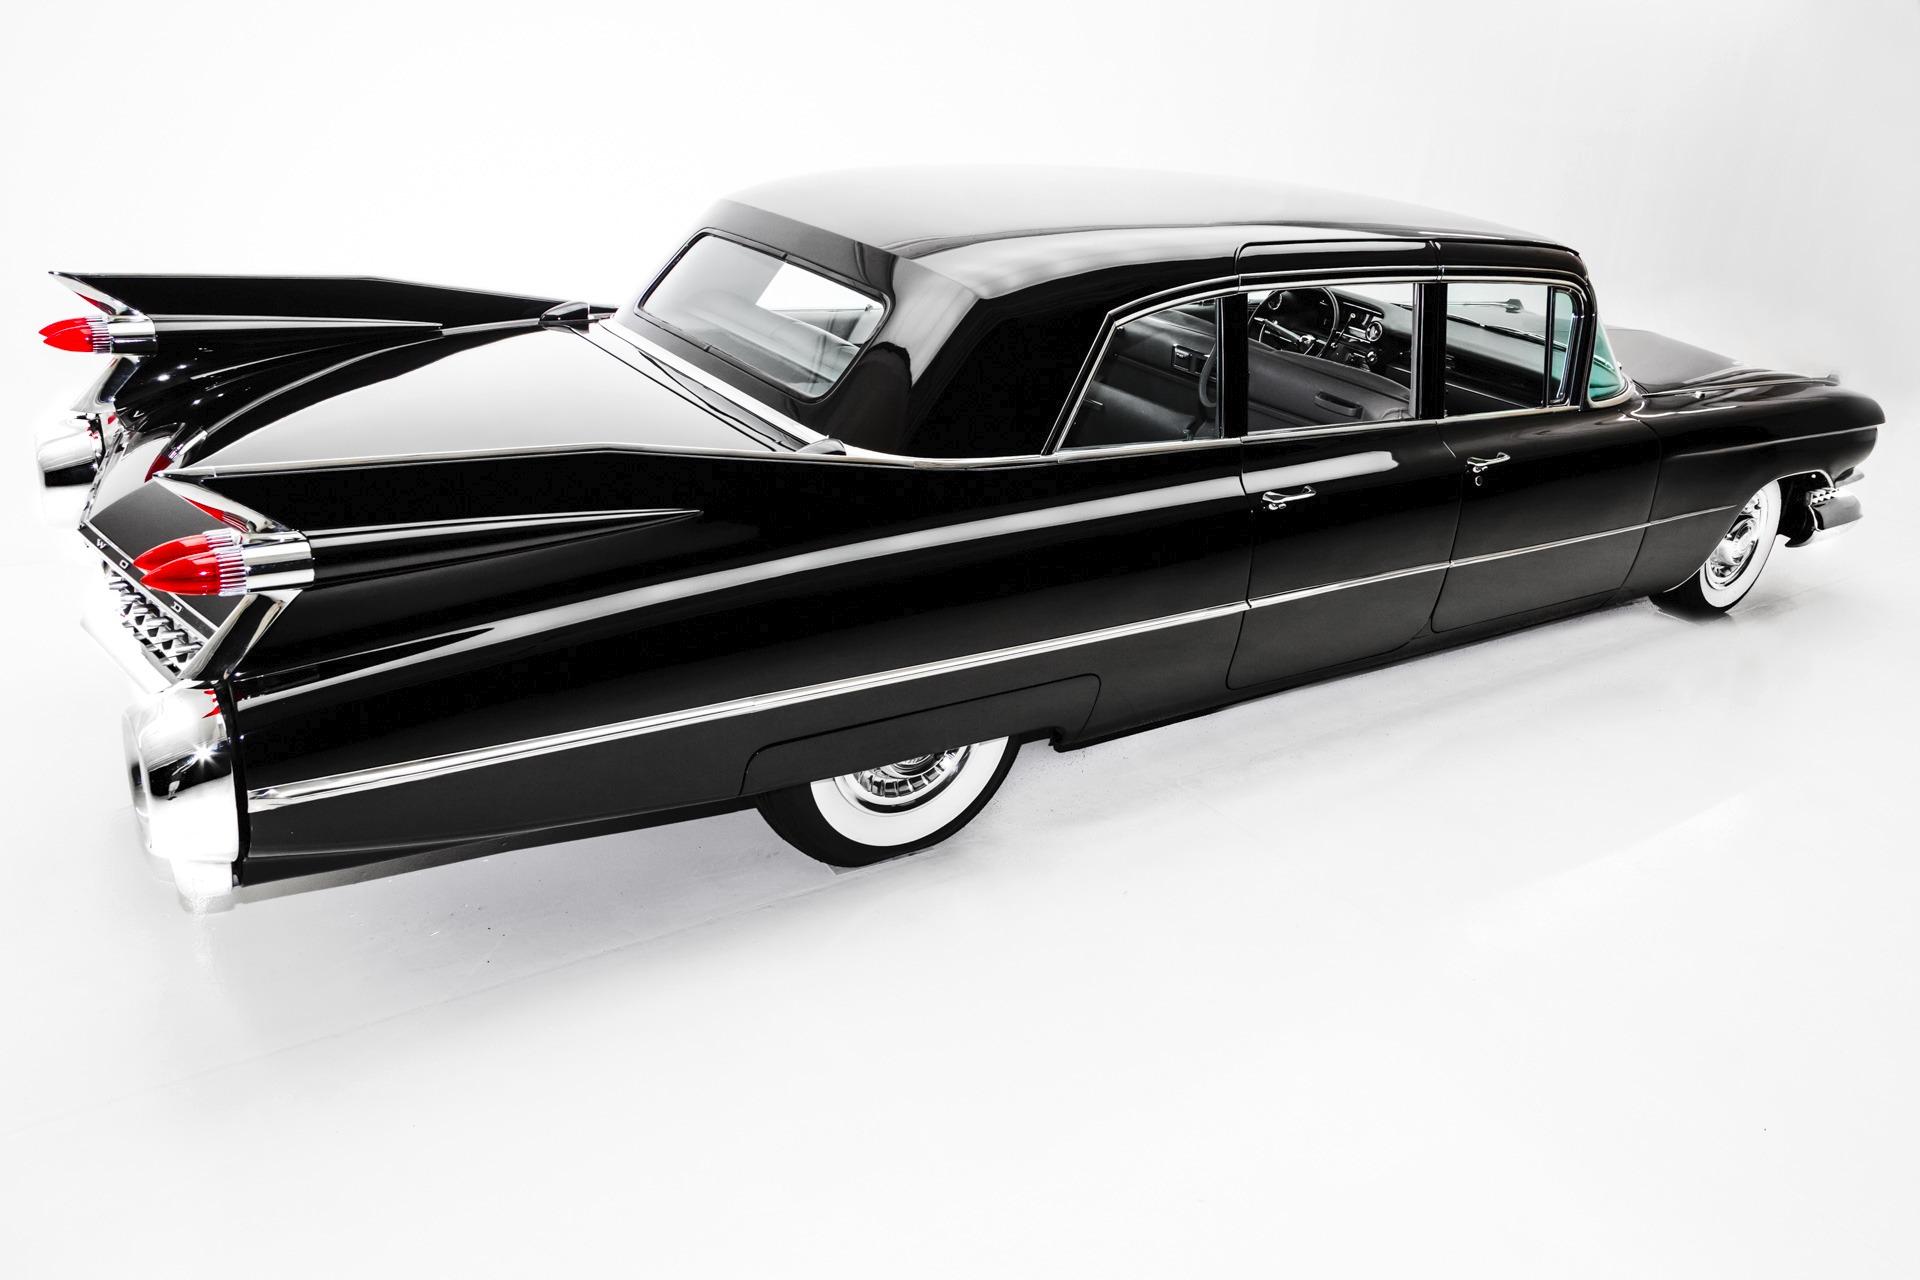 1959 Cadillac Fleetwood Limousine RARE Leather - American Dream ...